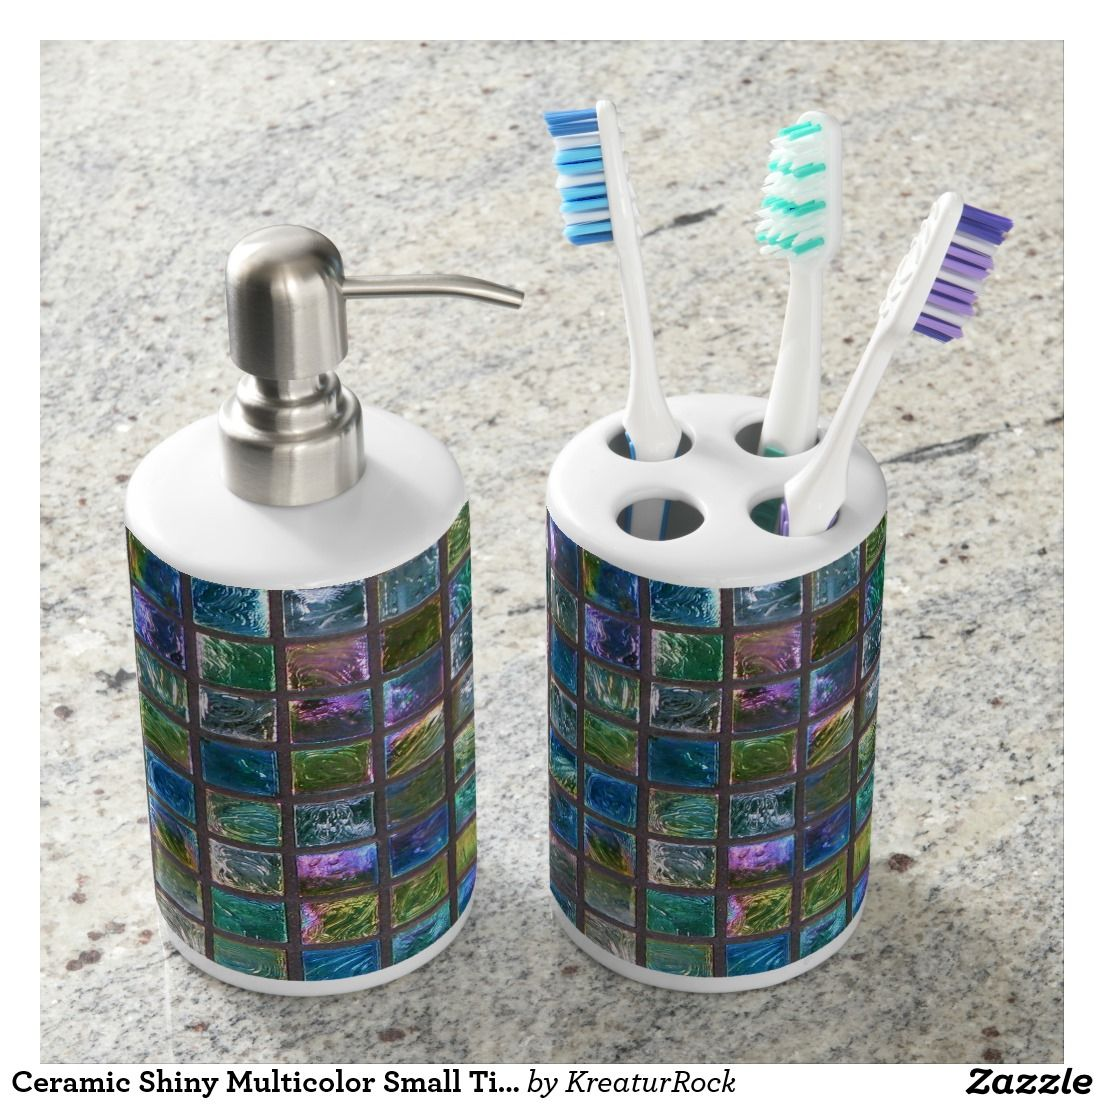 Ceramic Shiny Multicolor Small Tiles Dispenser Set